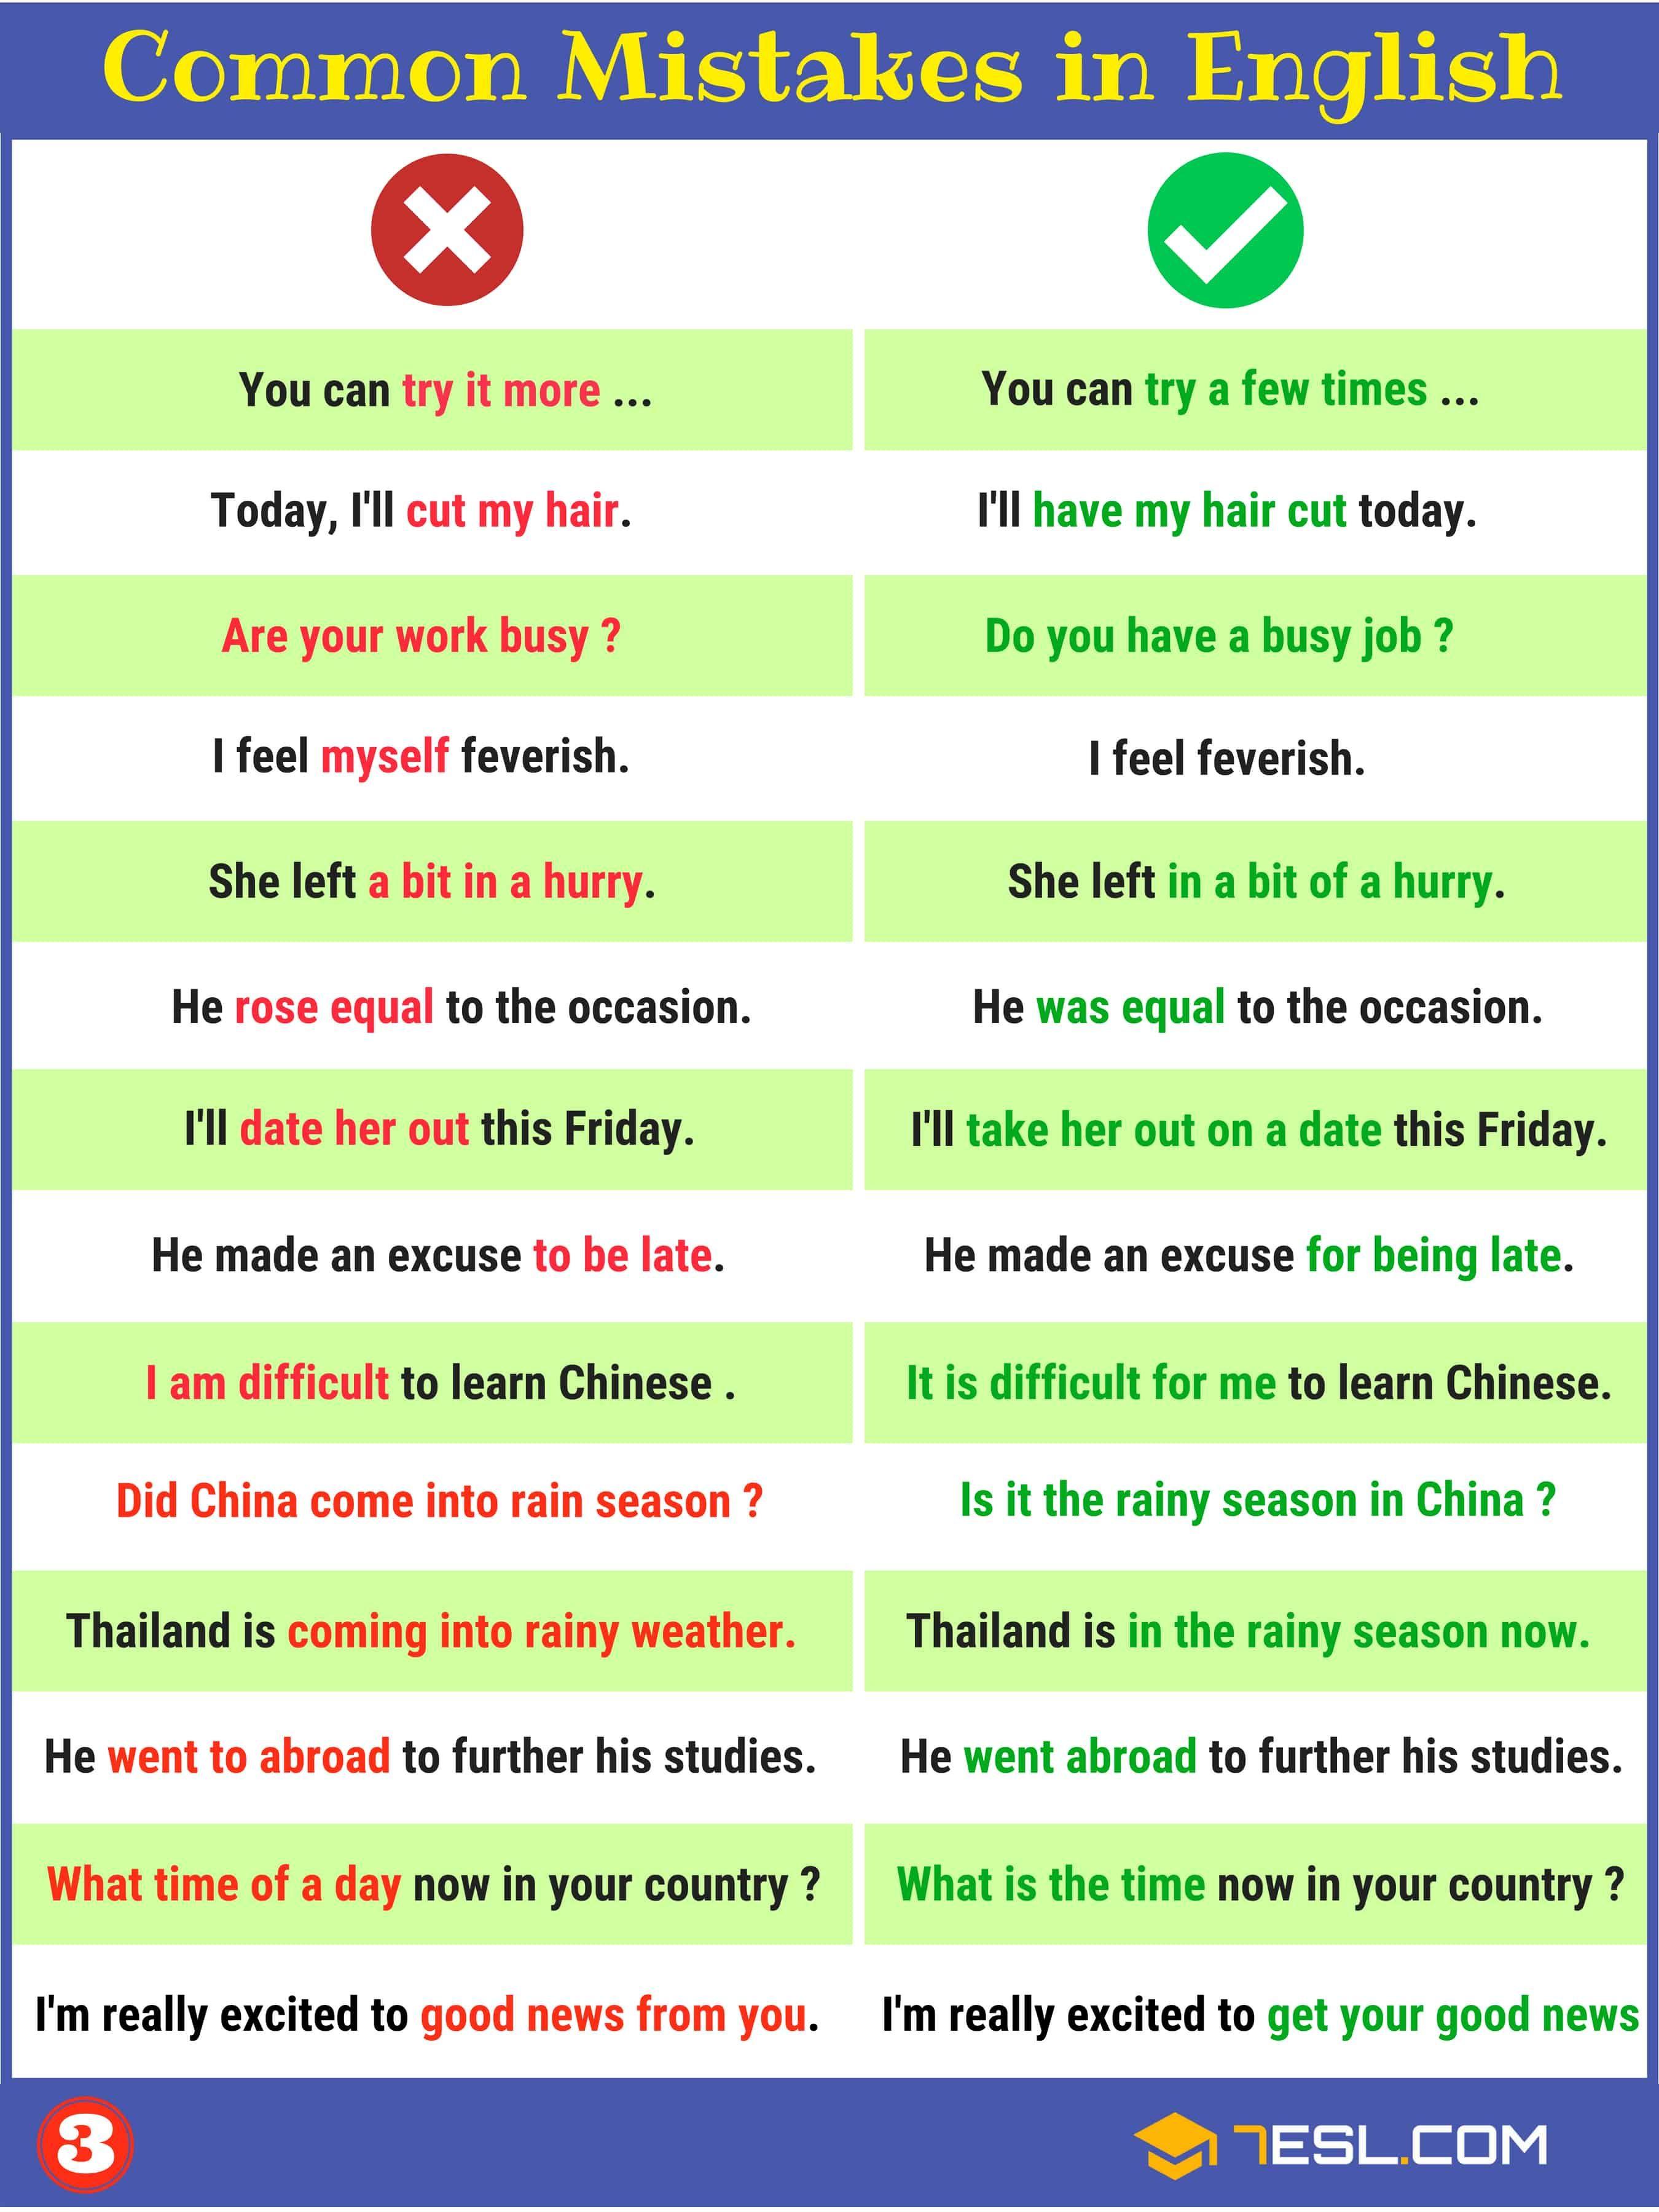 Grammatical Errors 170 Common Grammar Mistakes In English 7esl Common Grammar Mistakes Learn English English Study [ 3600 x 2700 Pixel ]